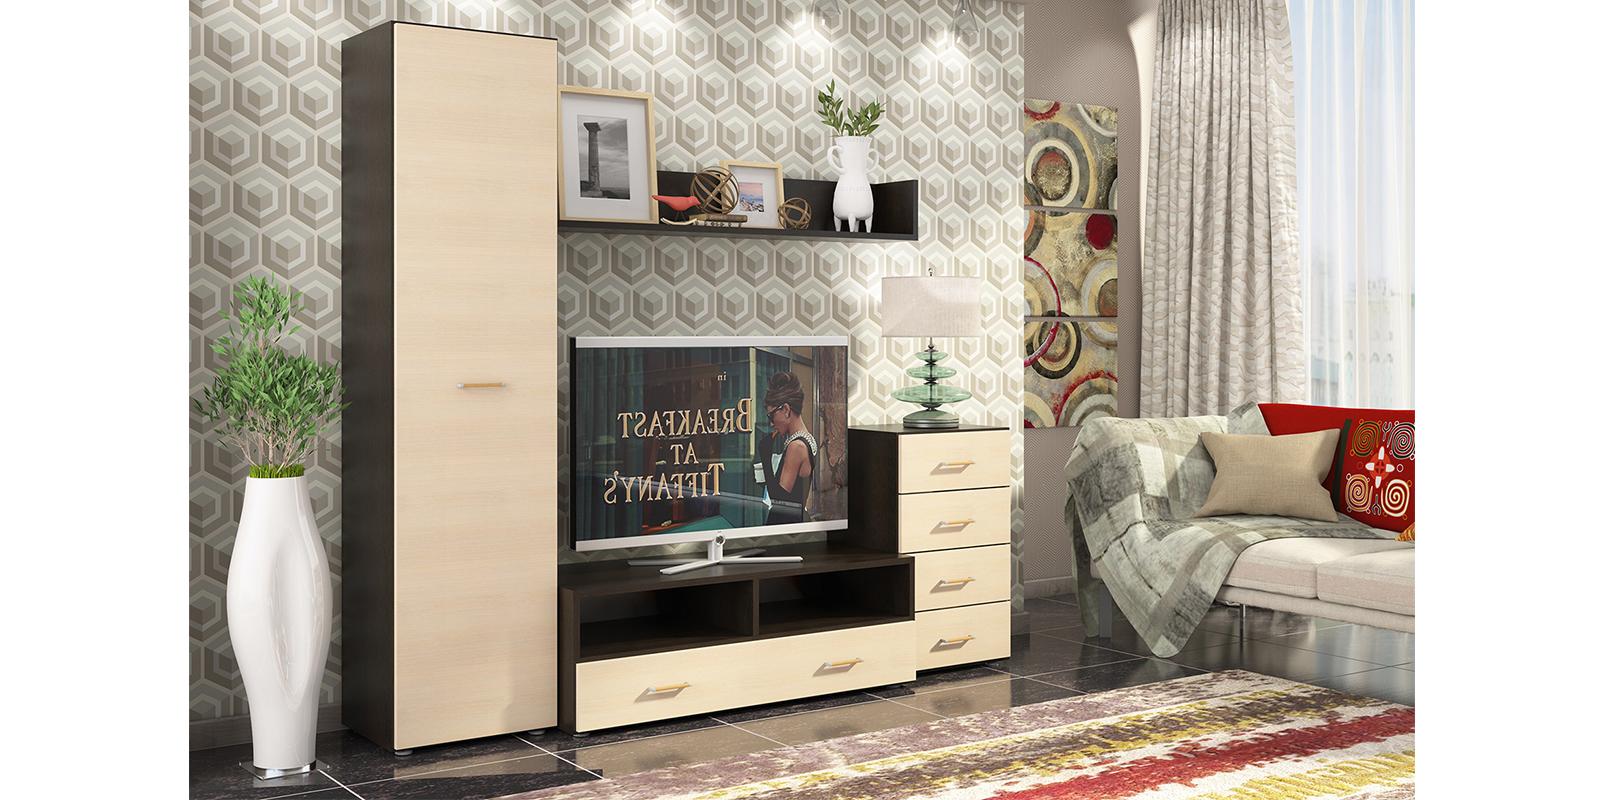 Модульная система Невада вариант №3 (дуб феррара/дуб кремона) от HomeMe.ru